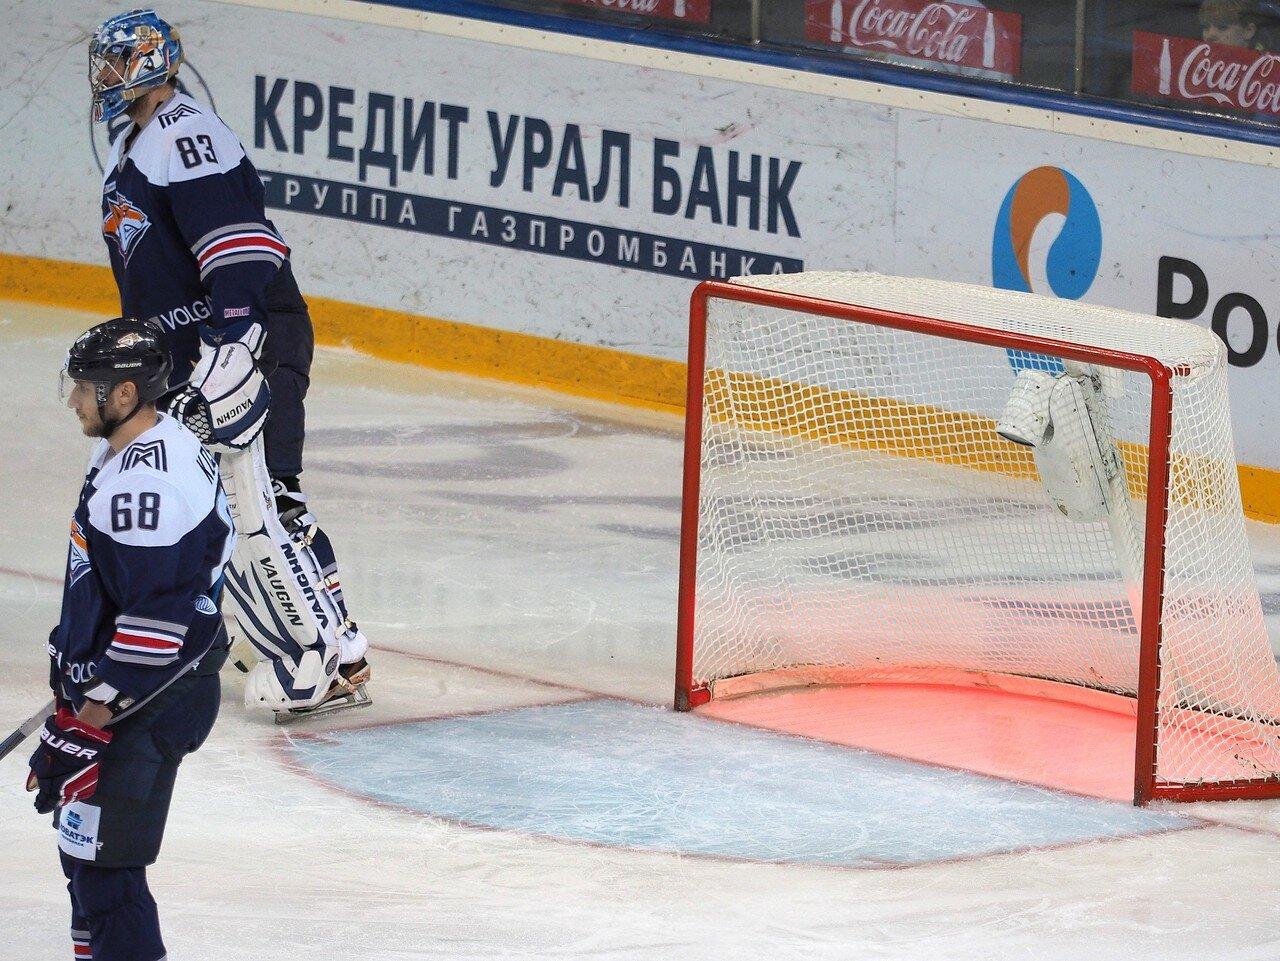 69Плей-офф 2016 Восток 1/2 Металлург - Сибирь 16.03.2016